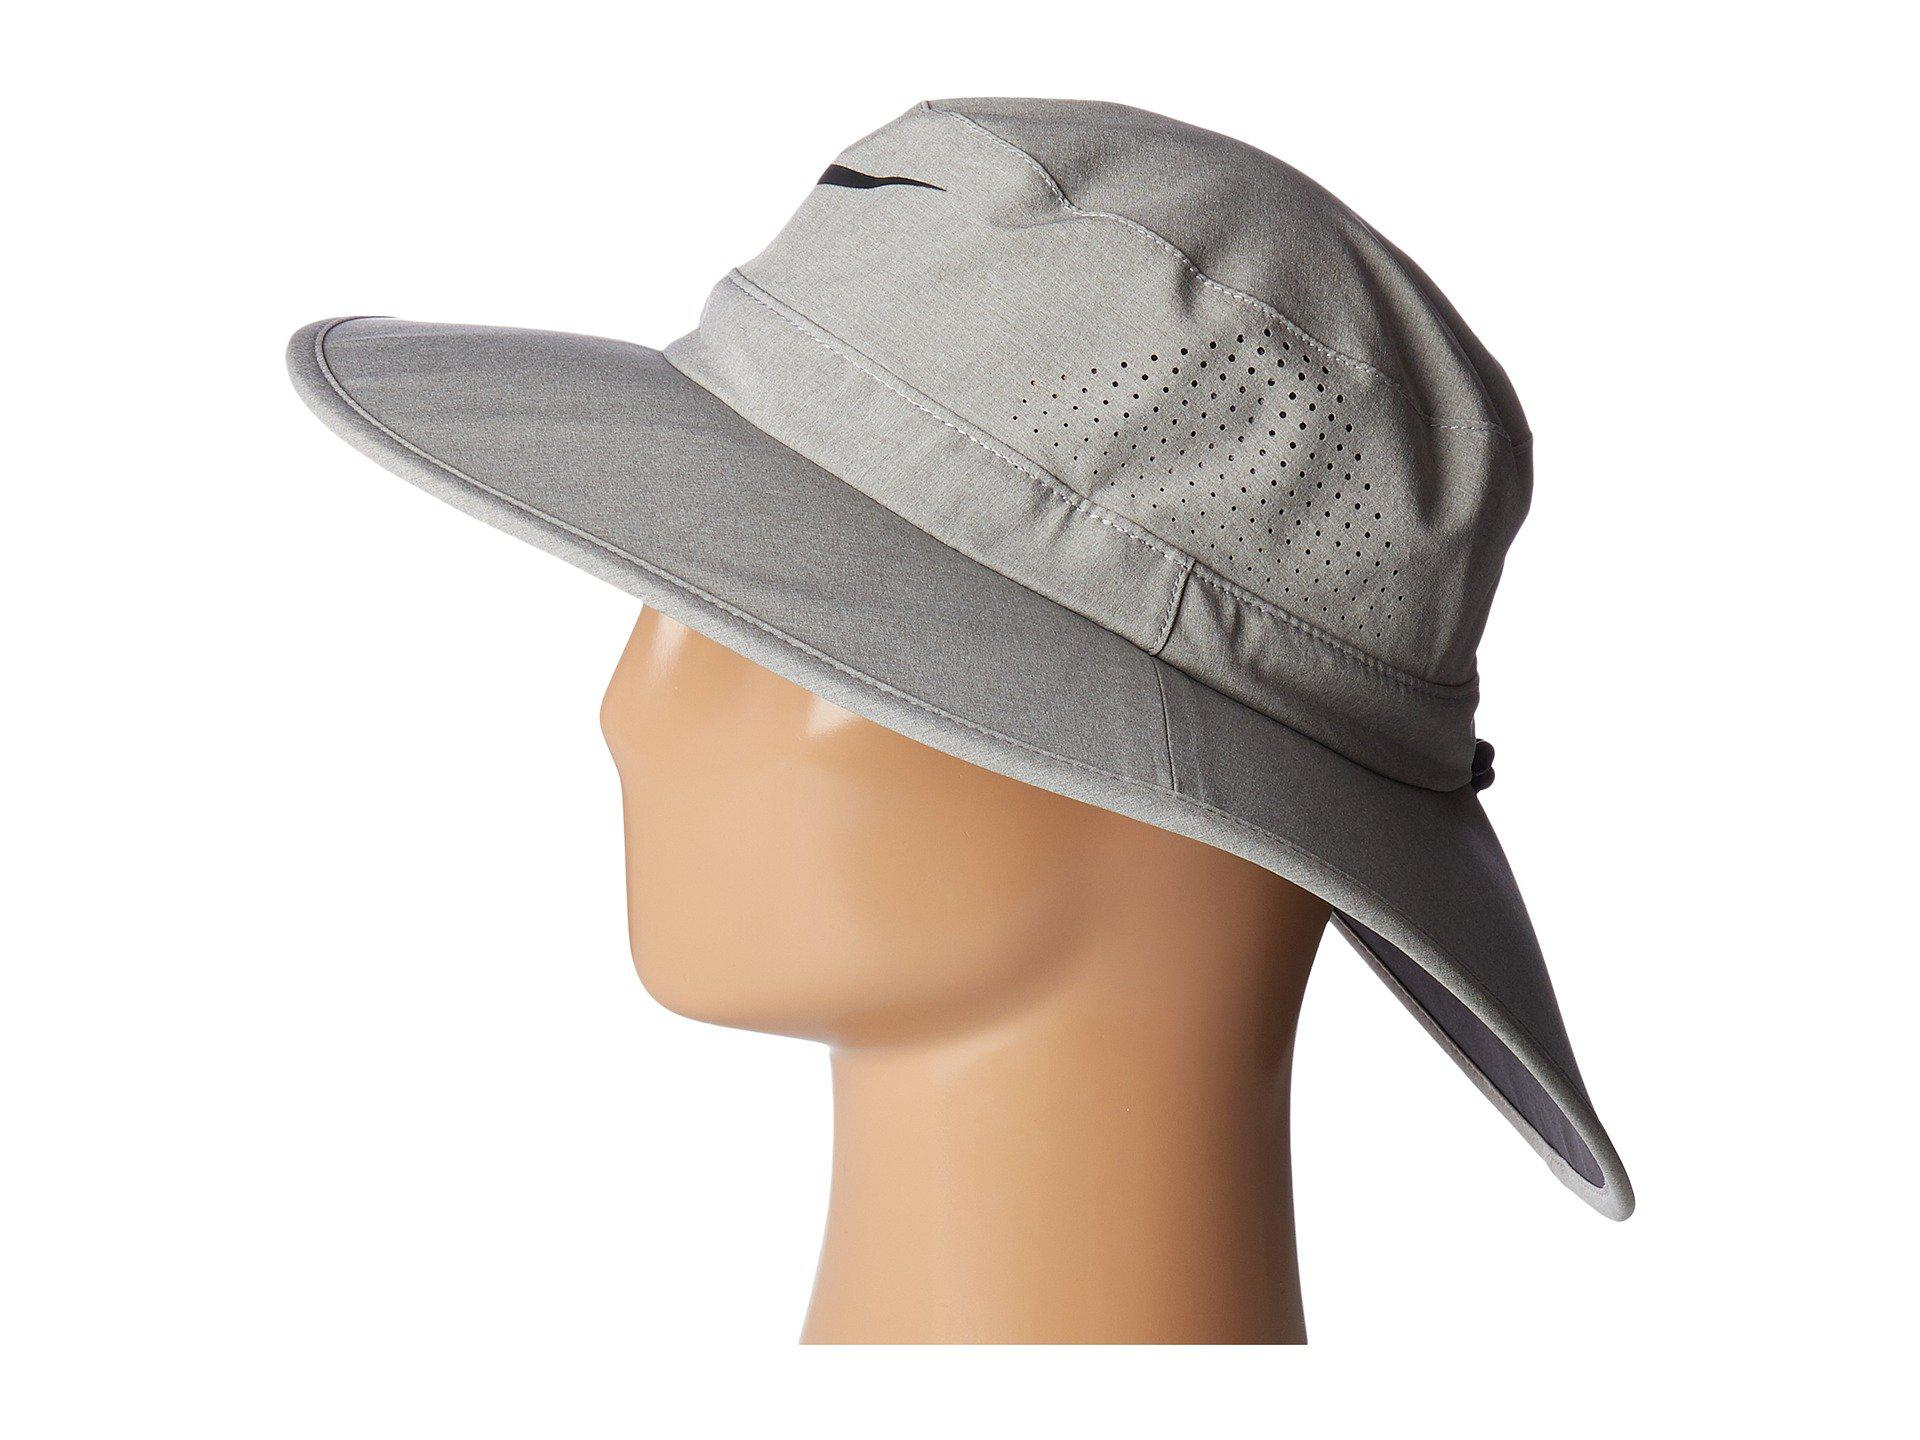 a5da623bd2a Lyst - Nike Sun Protect Cap 2.0 (black wolf Grey anthracite white ...